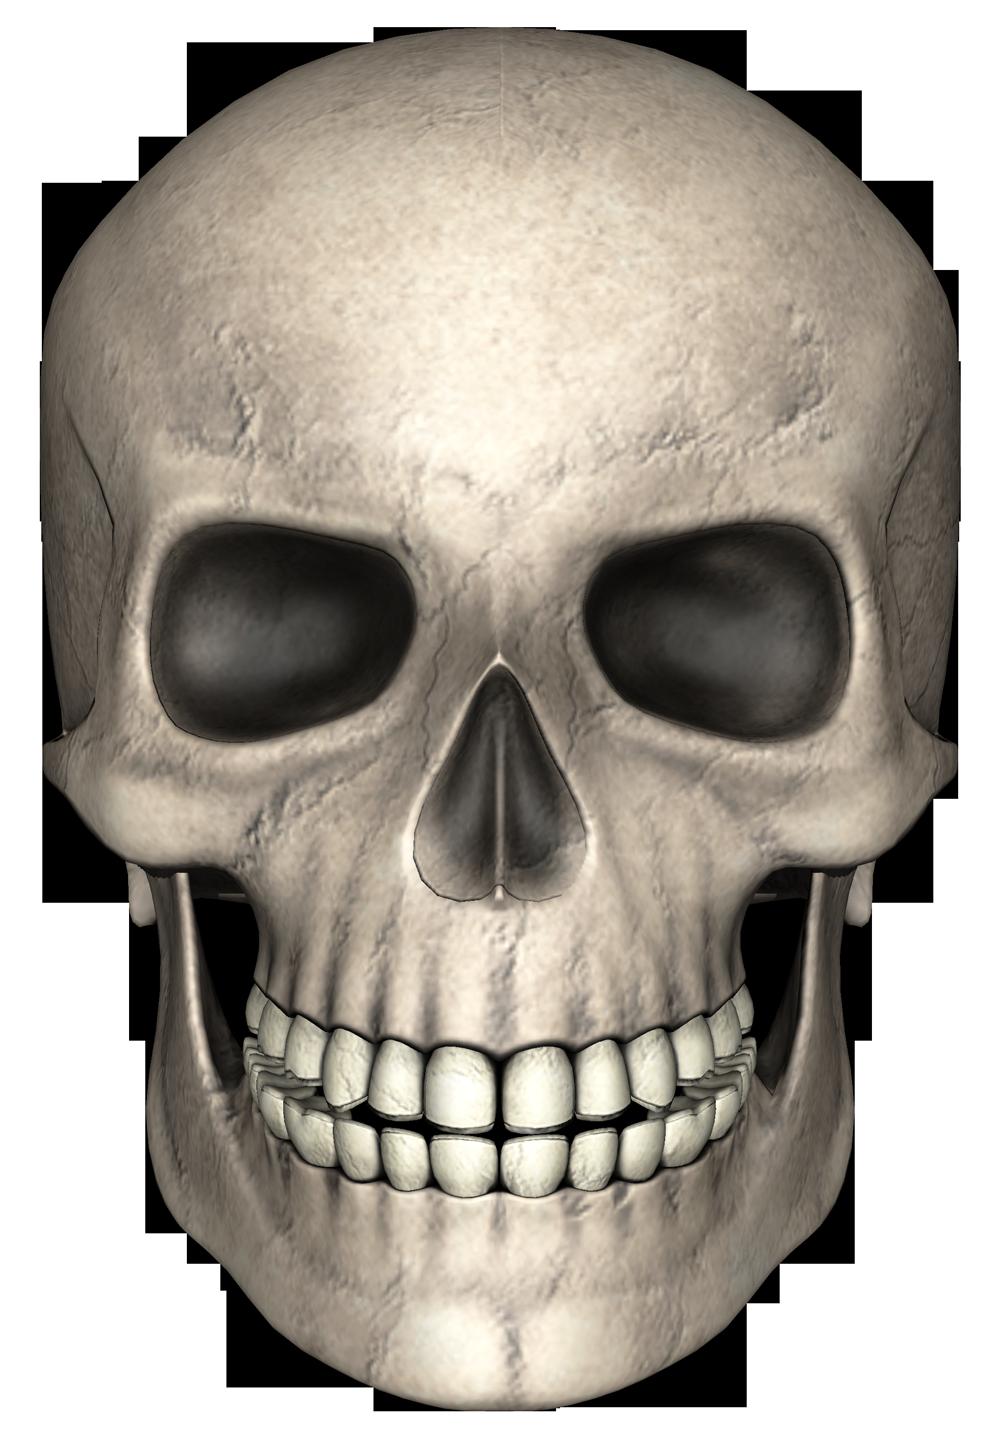 Skull Png Image Skull Real Skull Png